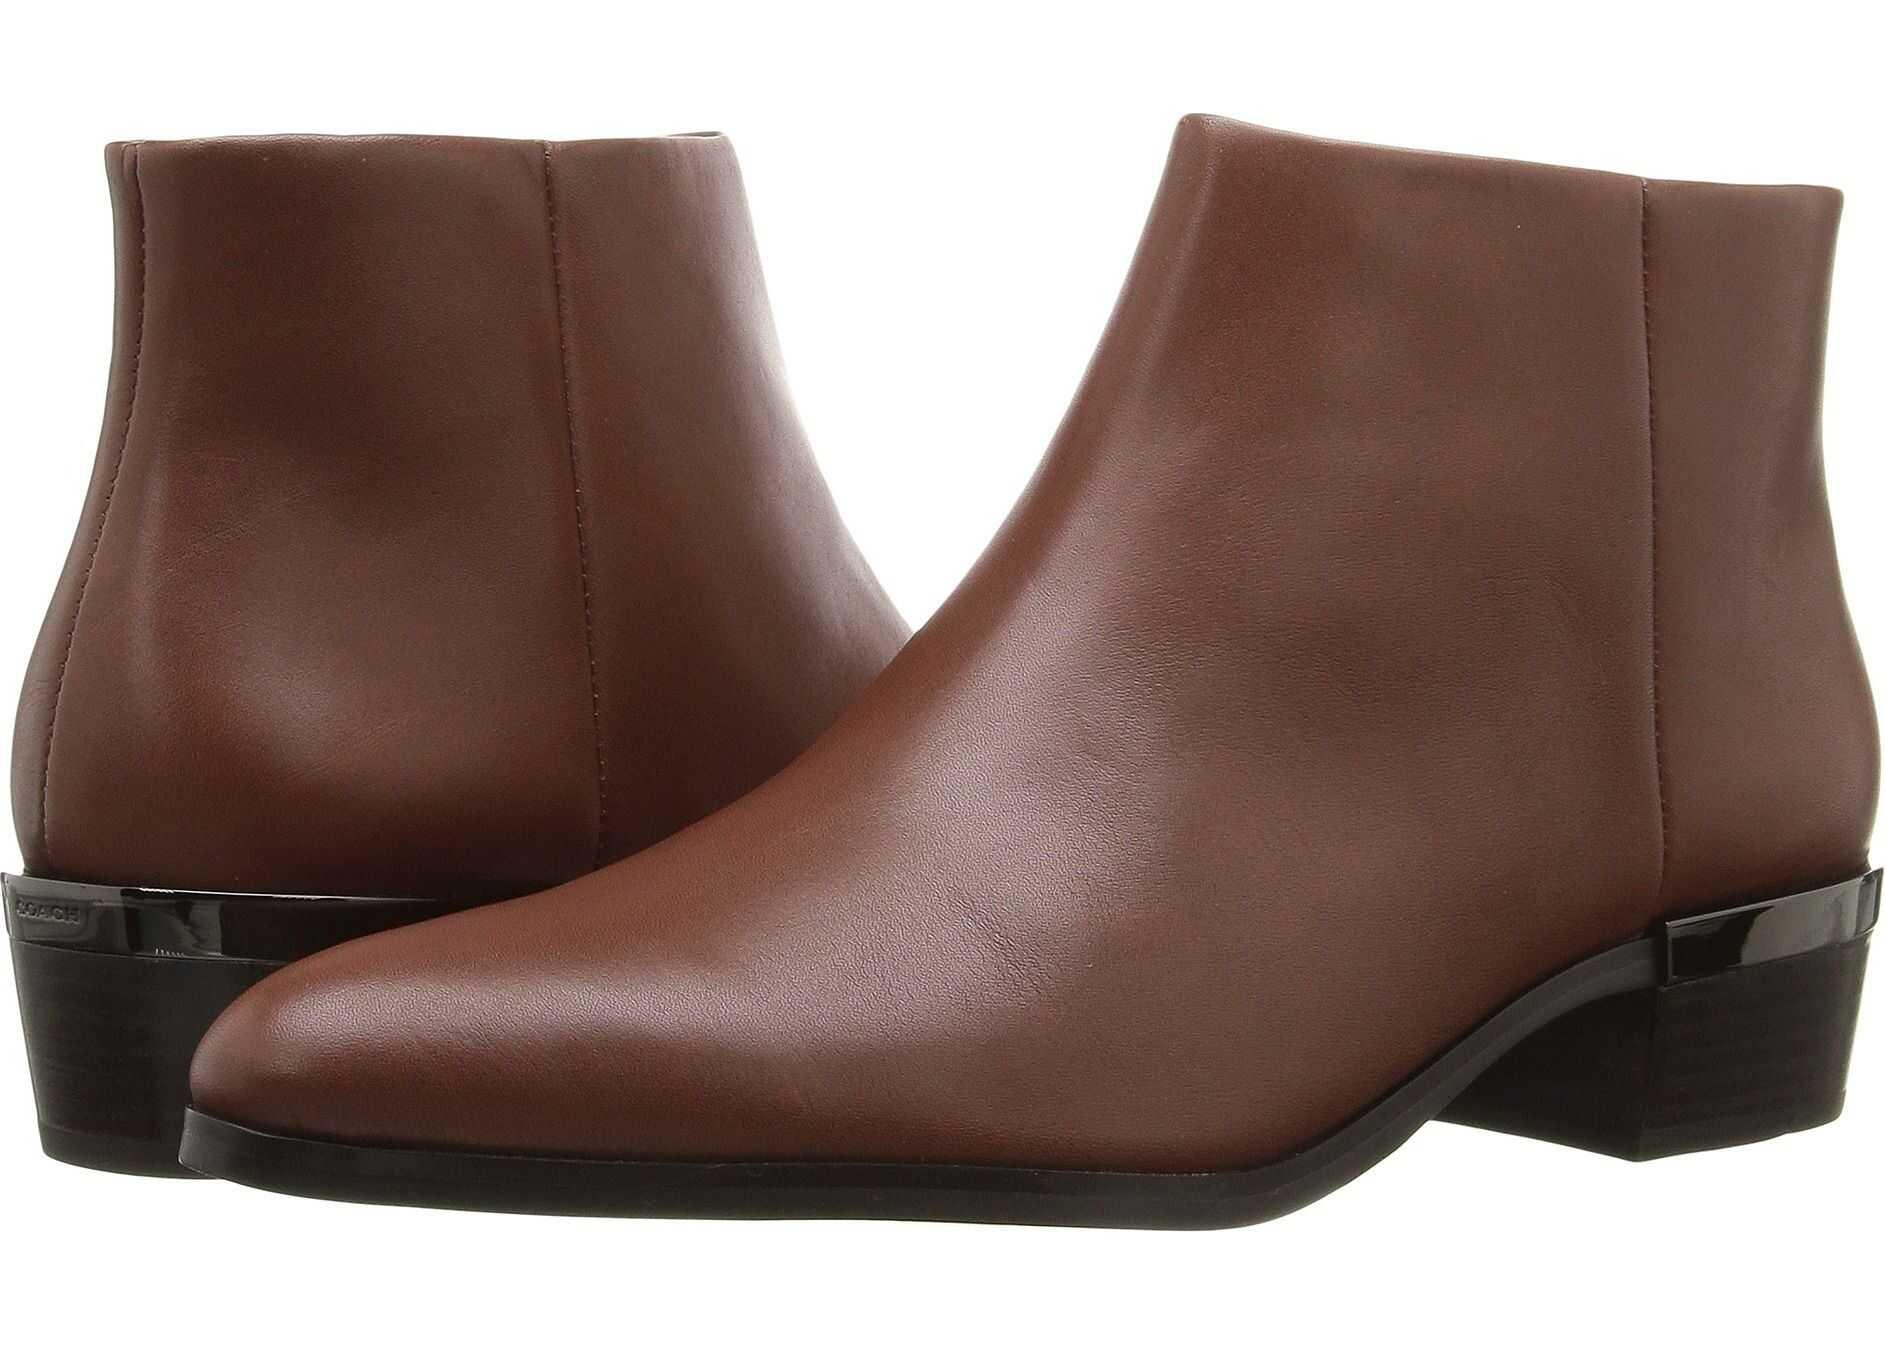 COACH Montana* Dark Saddle Soft Veg Leather